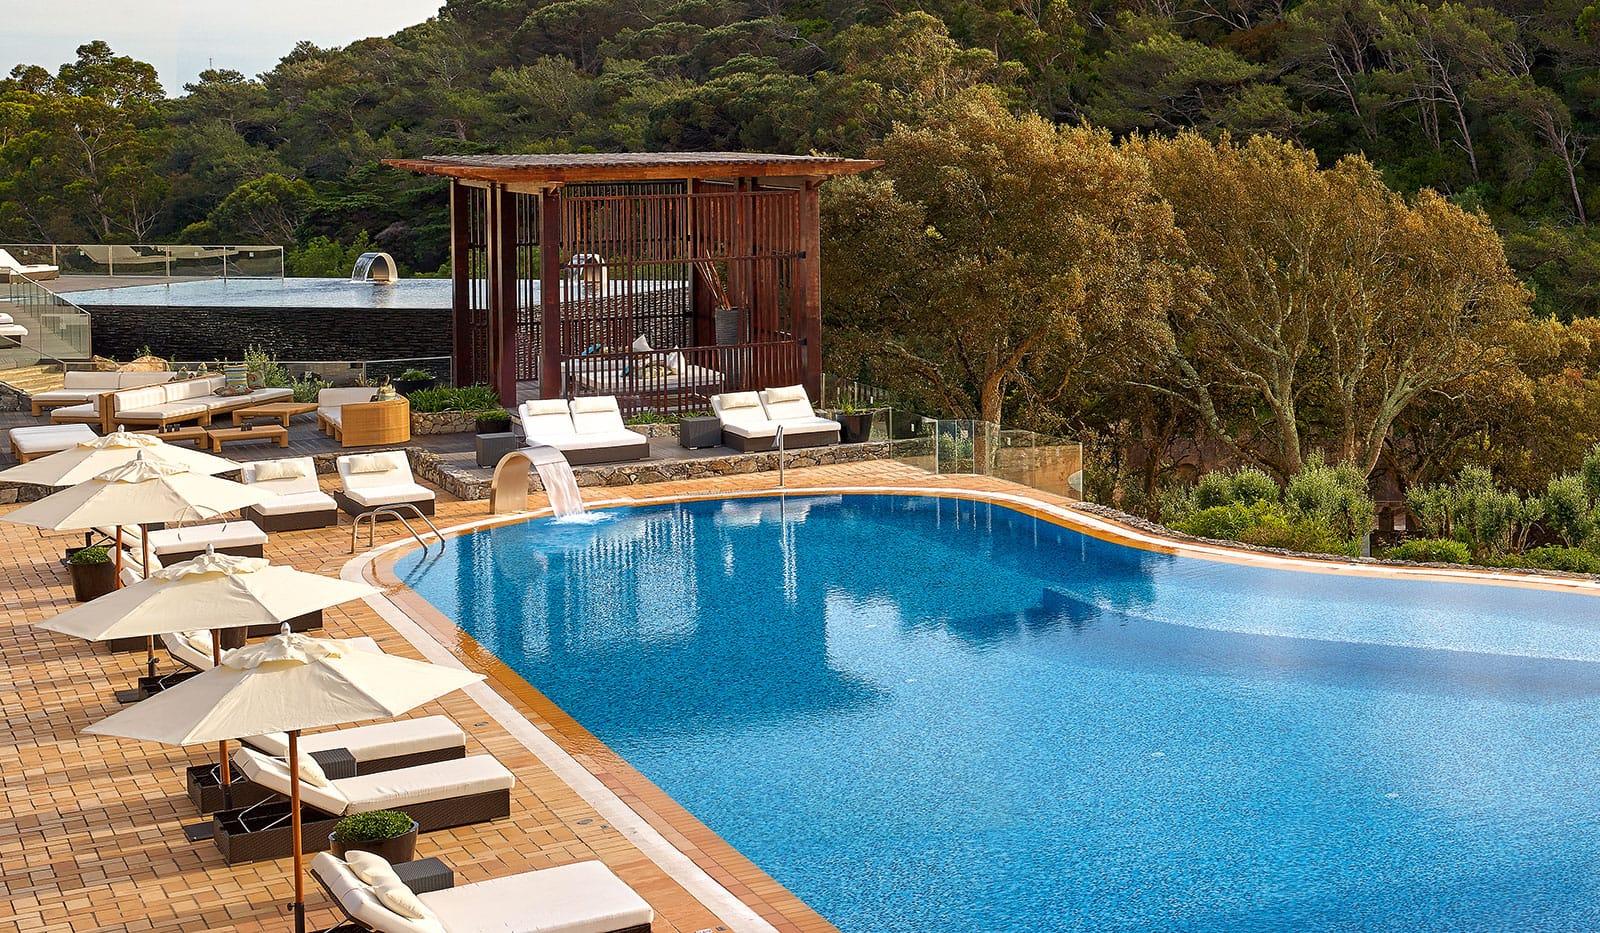 Pools Panoramic View - The Ritz Carlton, PenHa Longa - Portugal